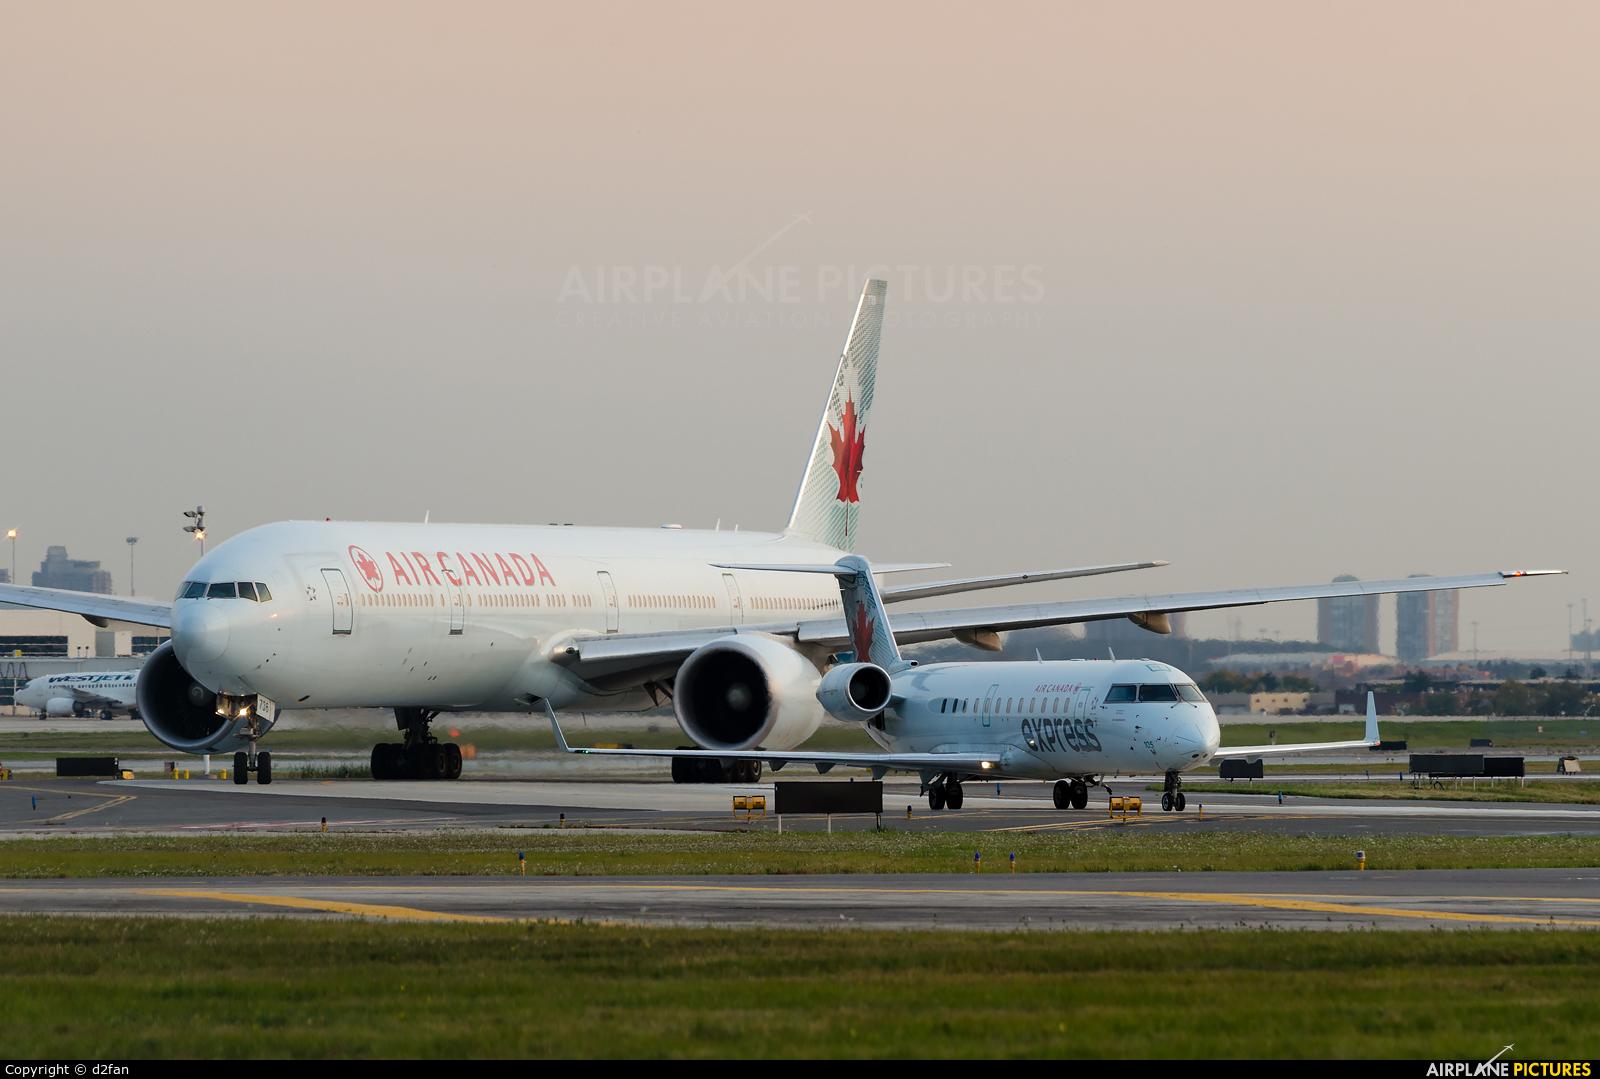 Air Canada Express C-FWRR aircraft at Toronto - Pearson Intl, ON